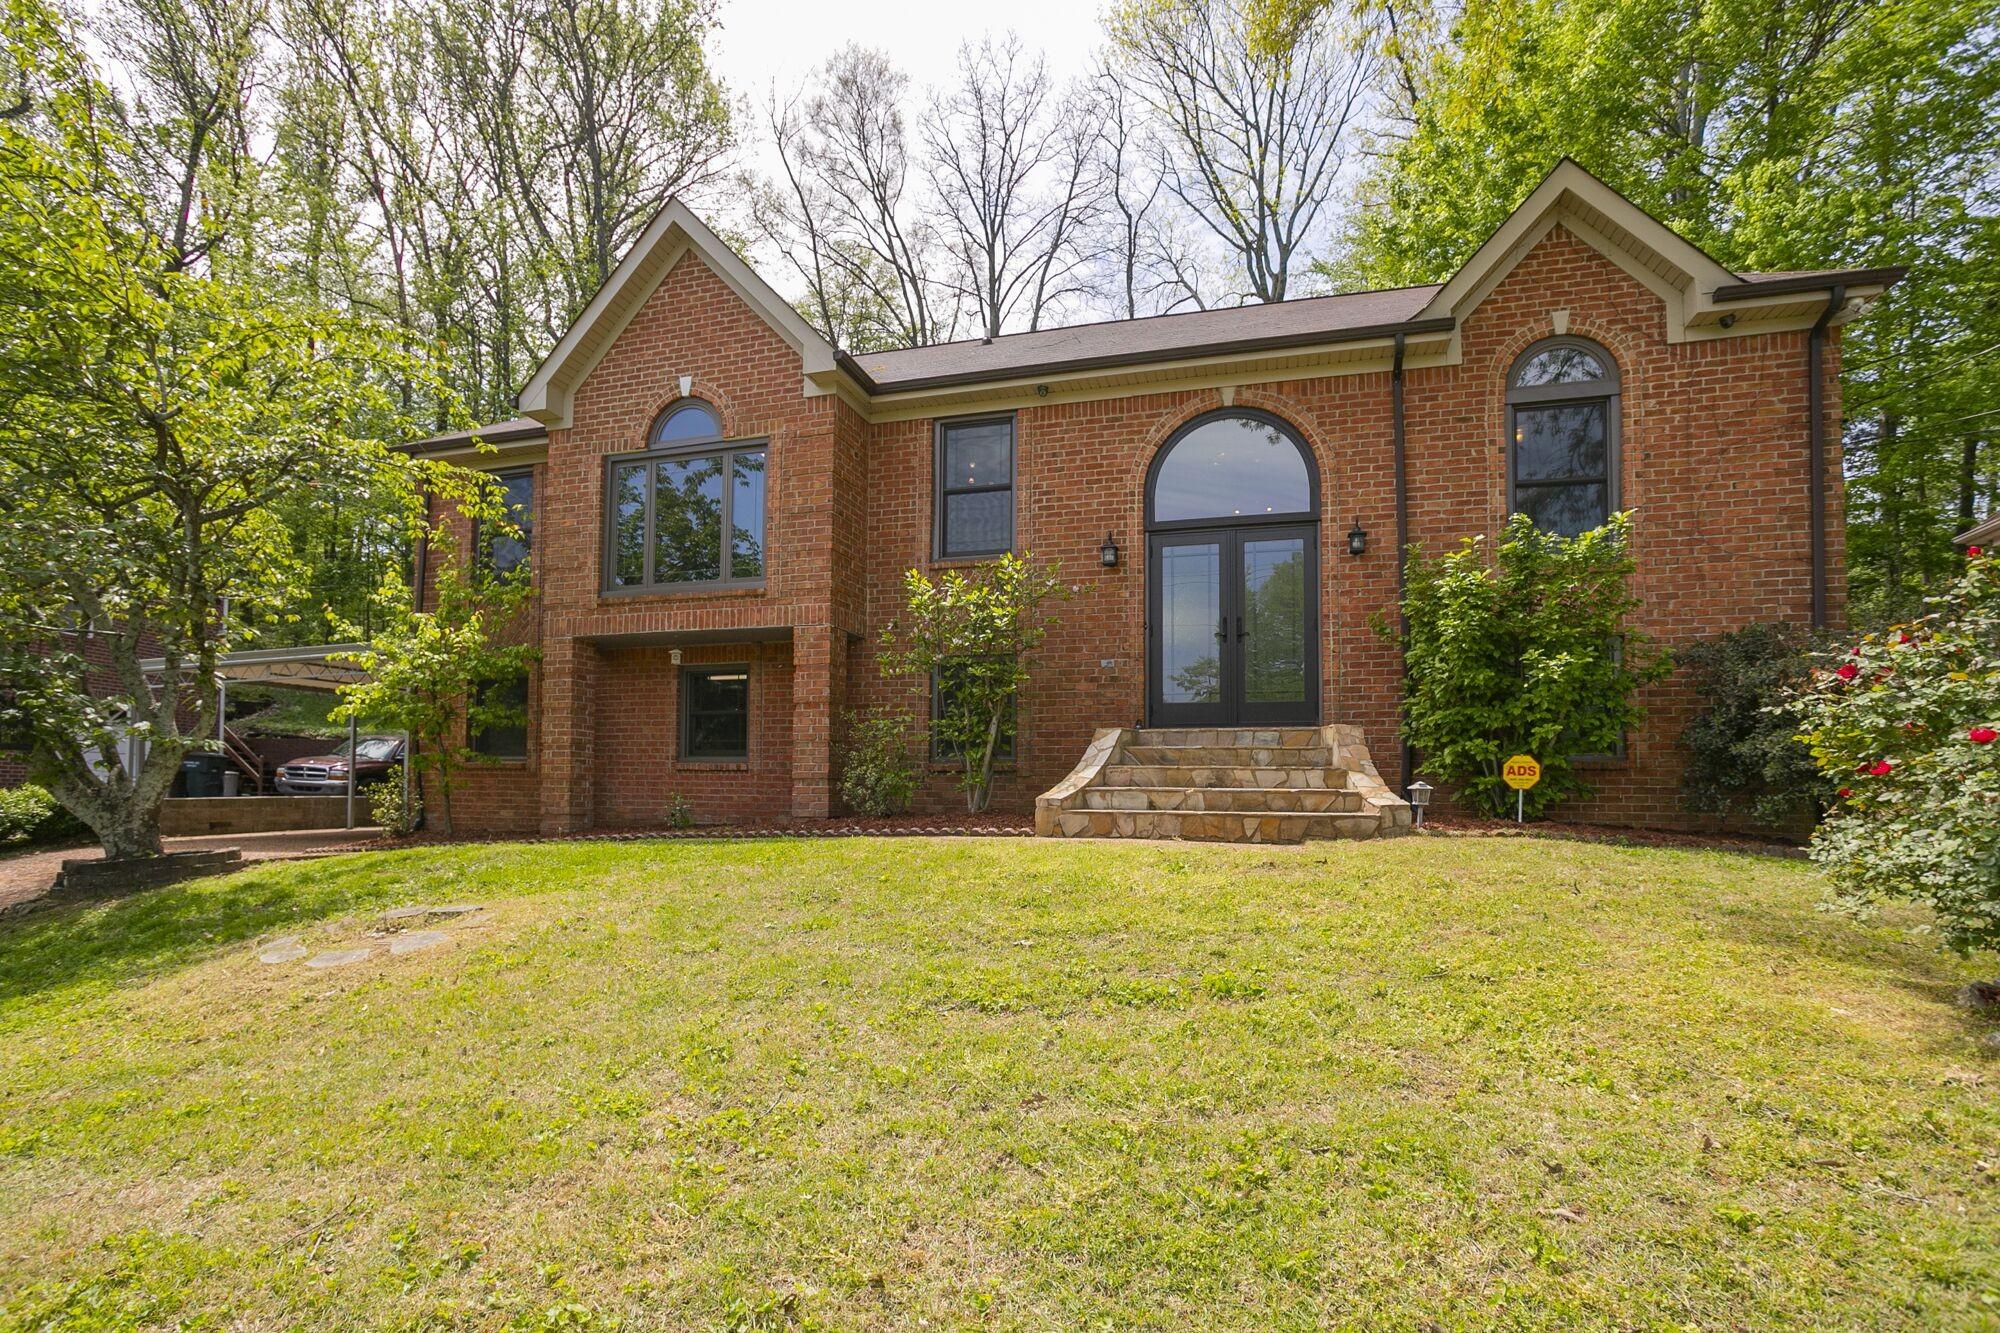 1017 Fitzpatrick Rd, Nashville, TN 37214 - Nashville, TN real estate listing